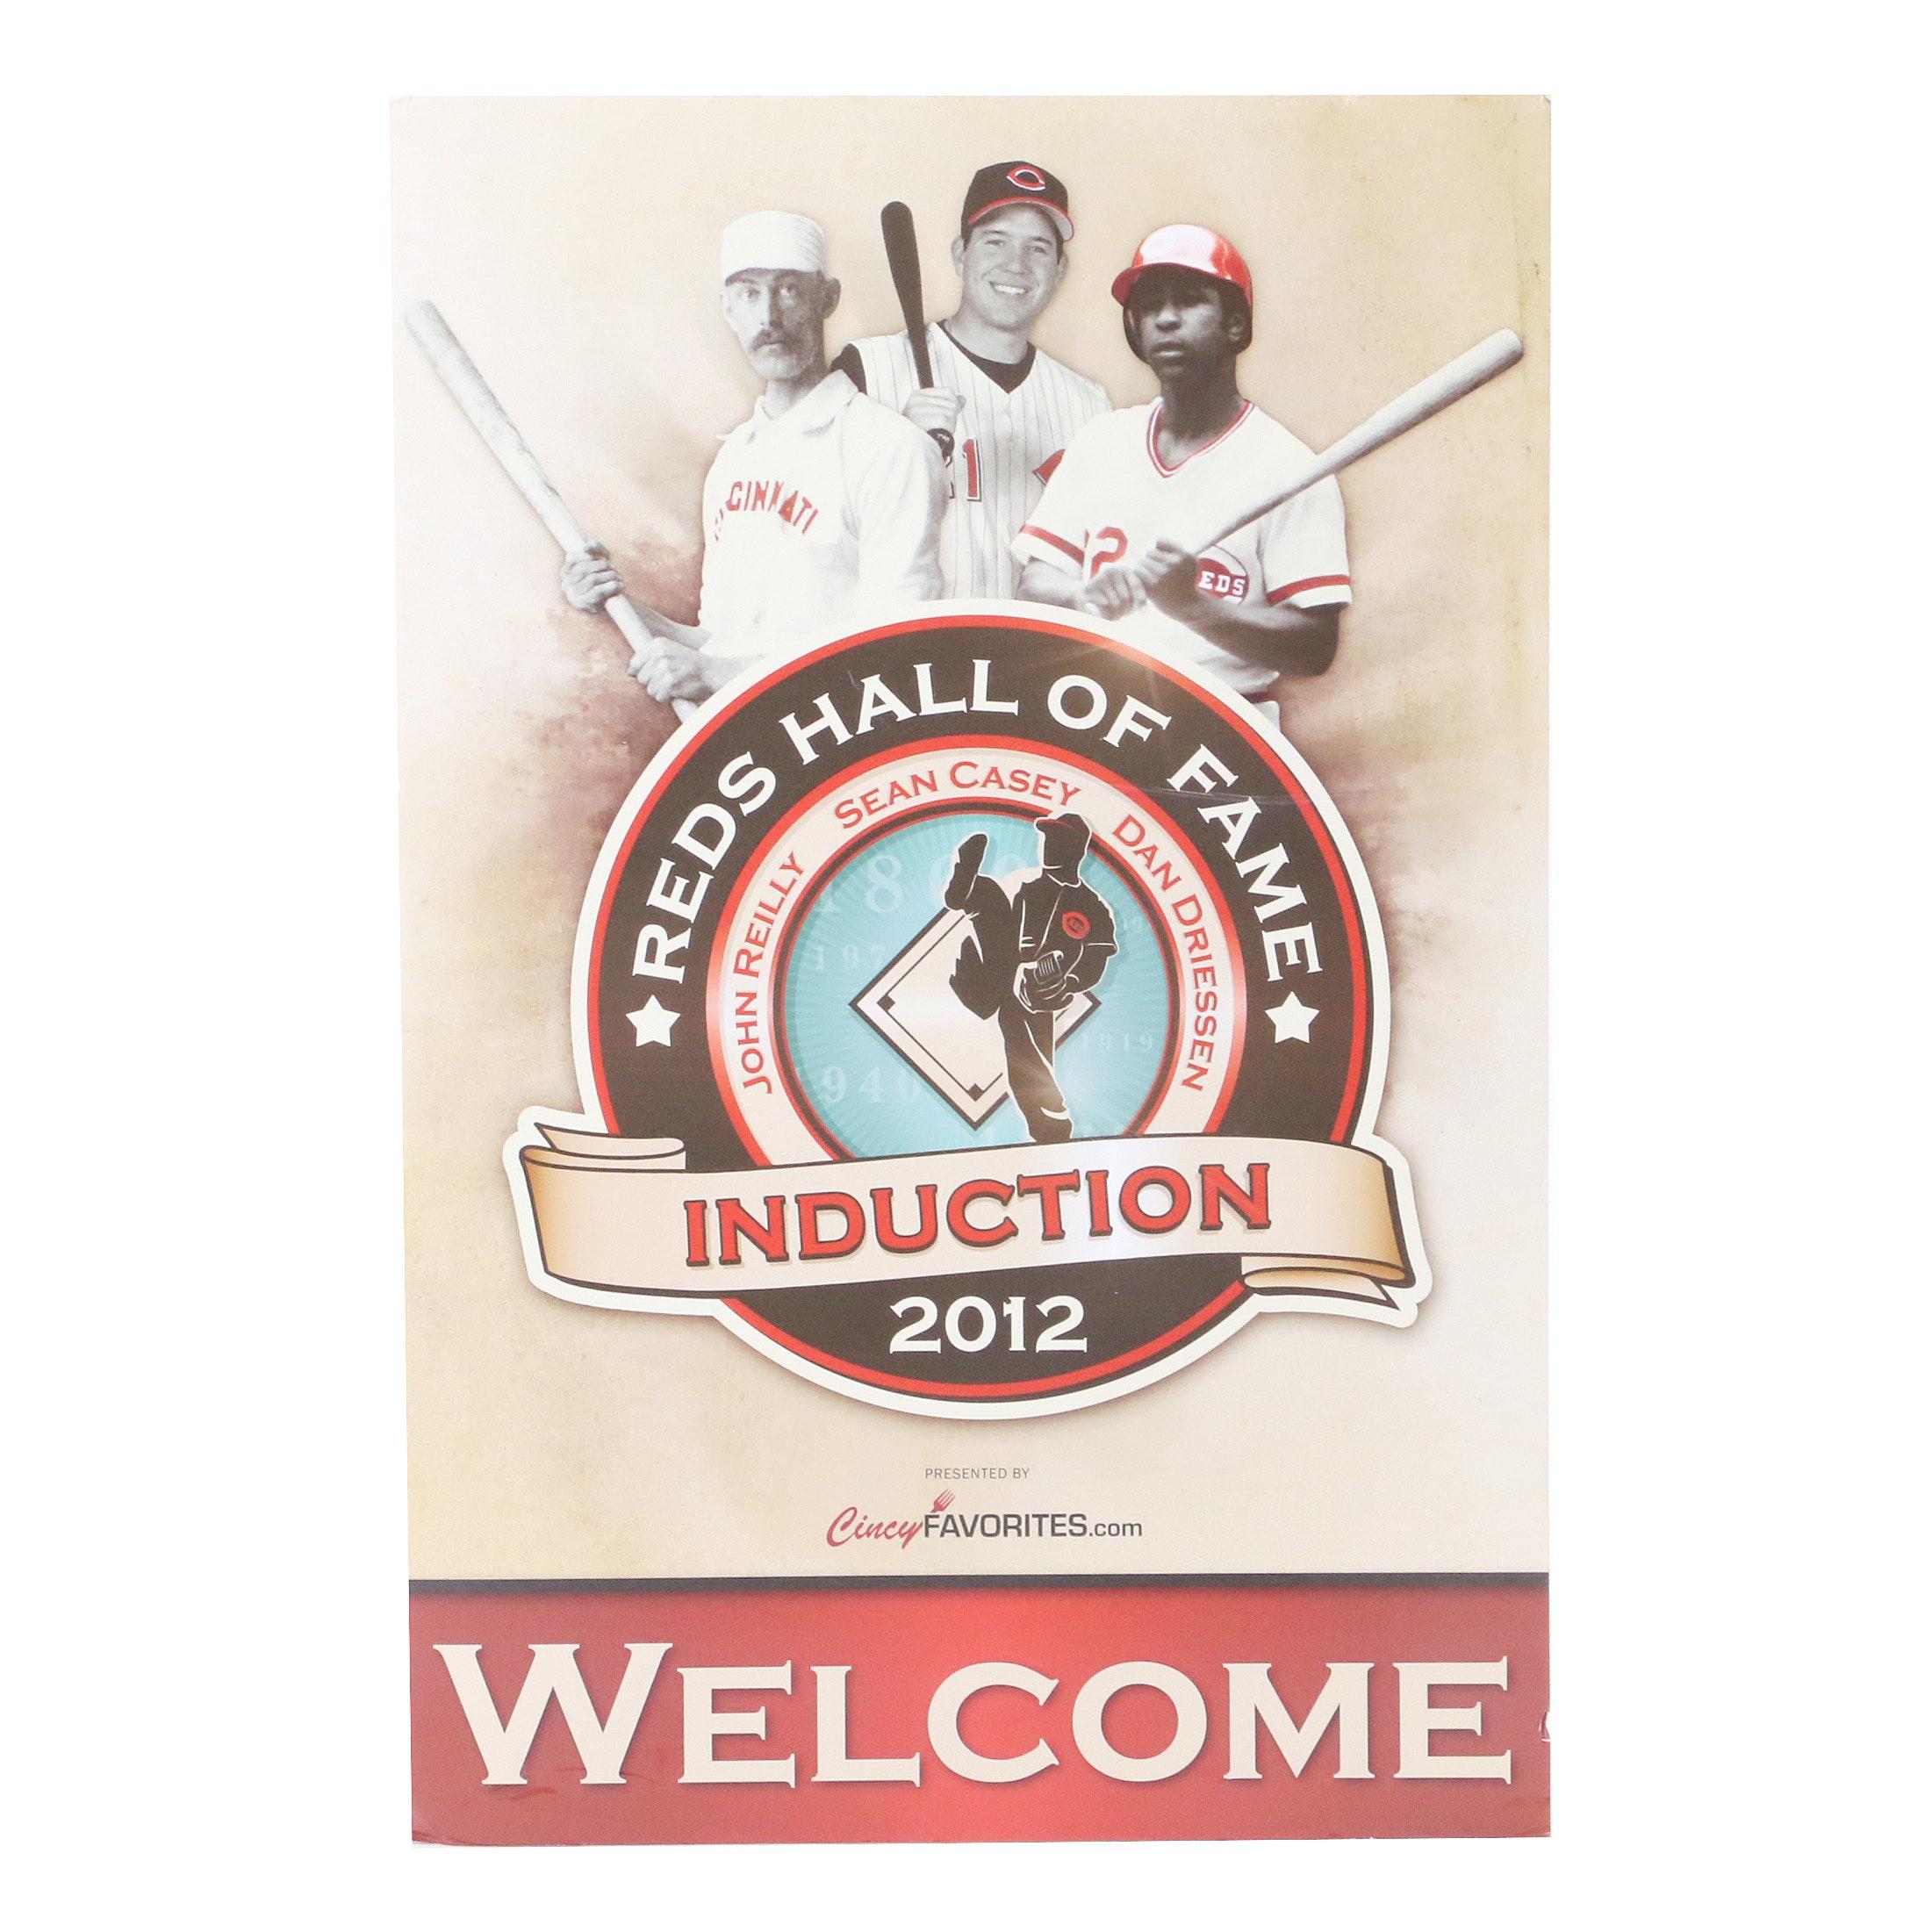 2012 Cincinnati Reds Hall of Fame Induction Display COA